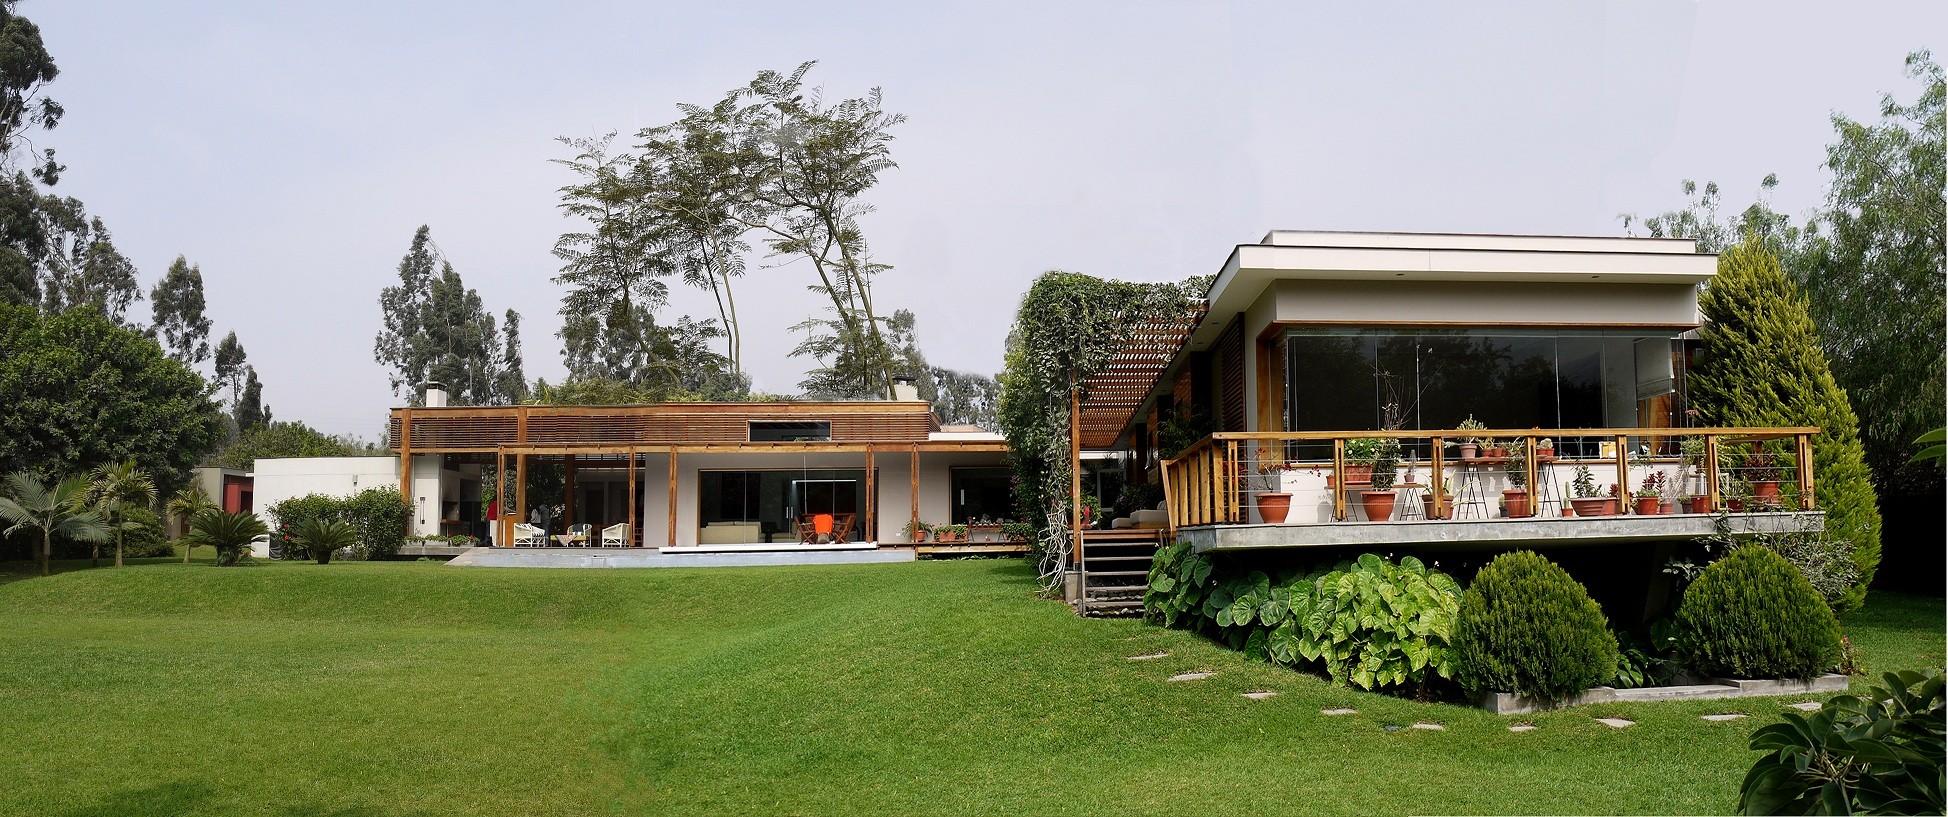 Casa de campo el ombu oscar gonzalez moix plataforma - Casas de campo por dentro ...